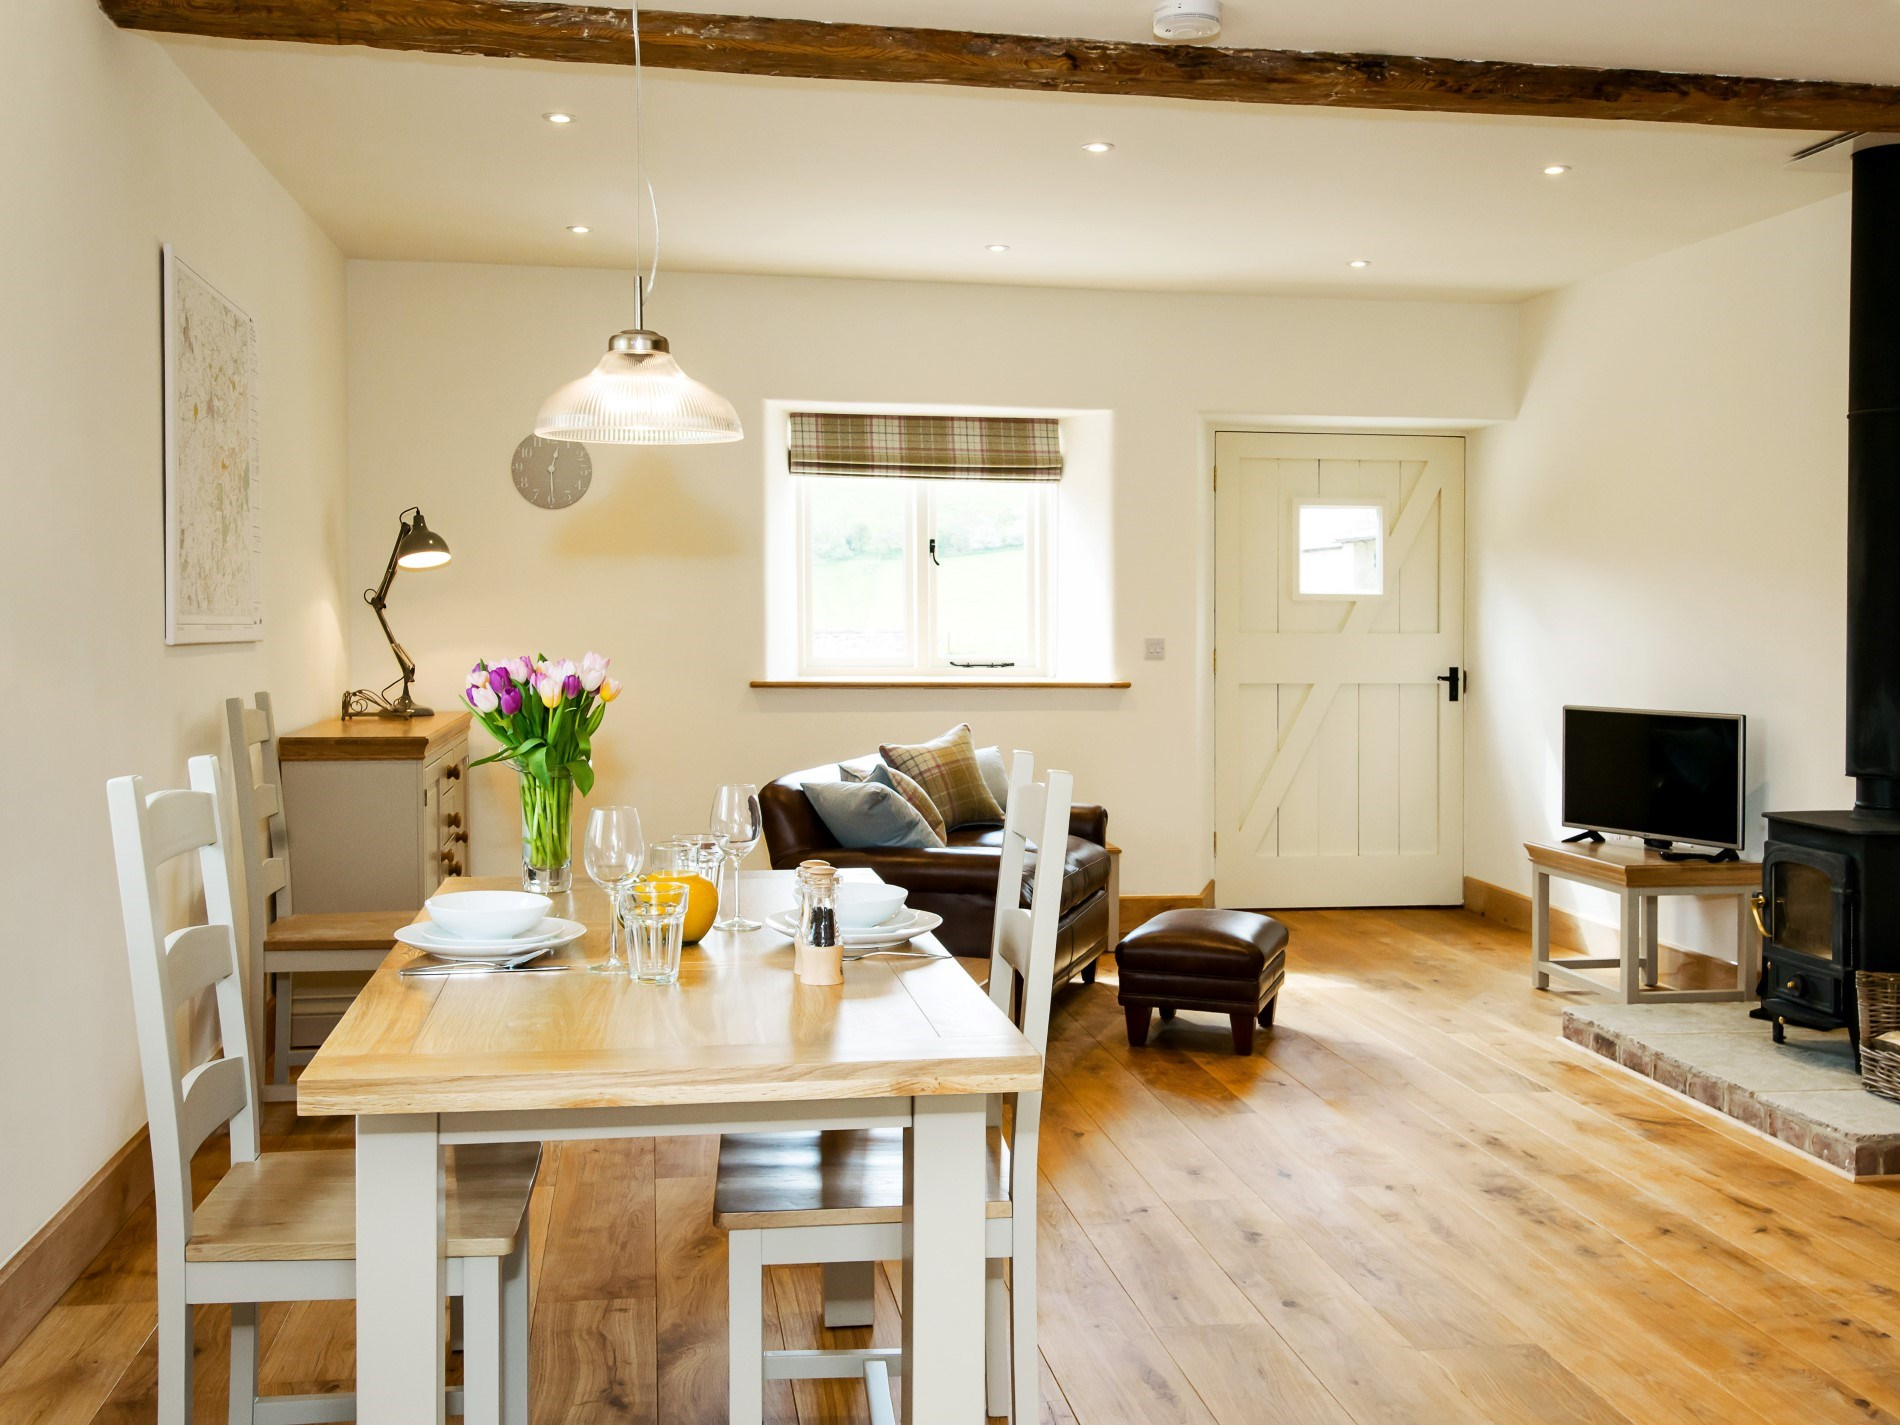 1 Bedroom Cottage in Shaftesbury, Dorset and Somerset